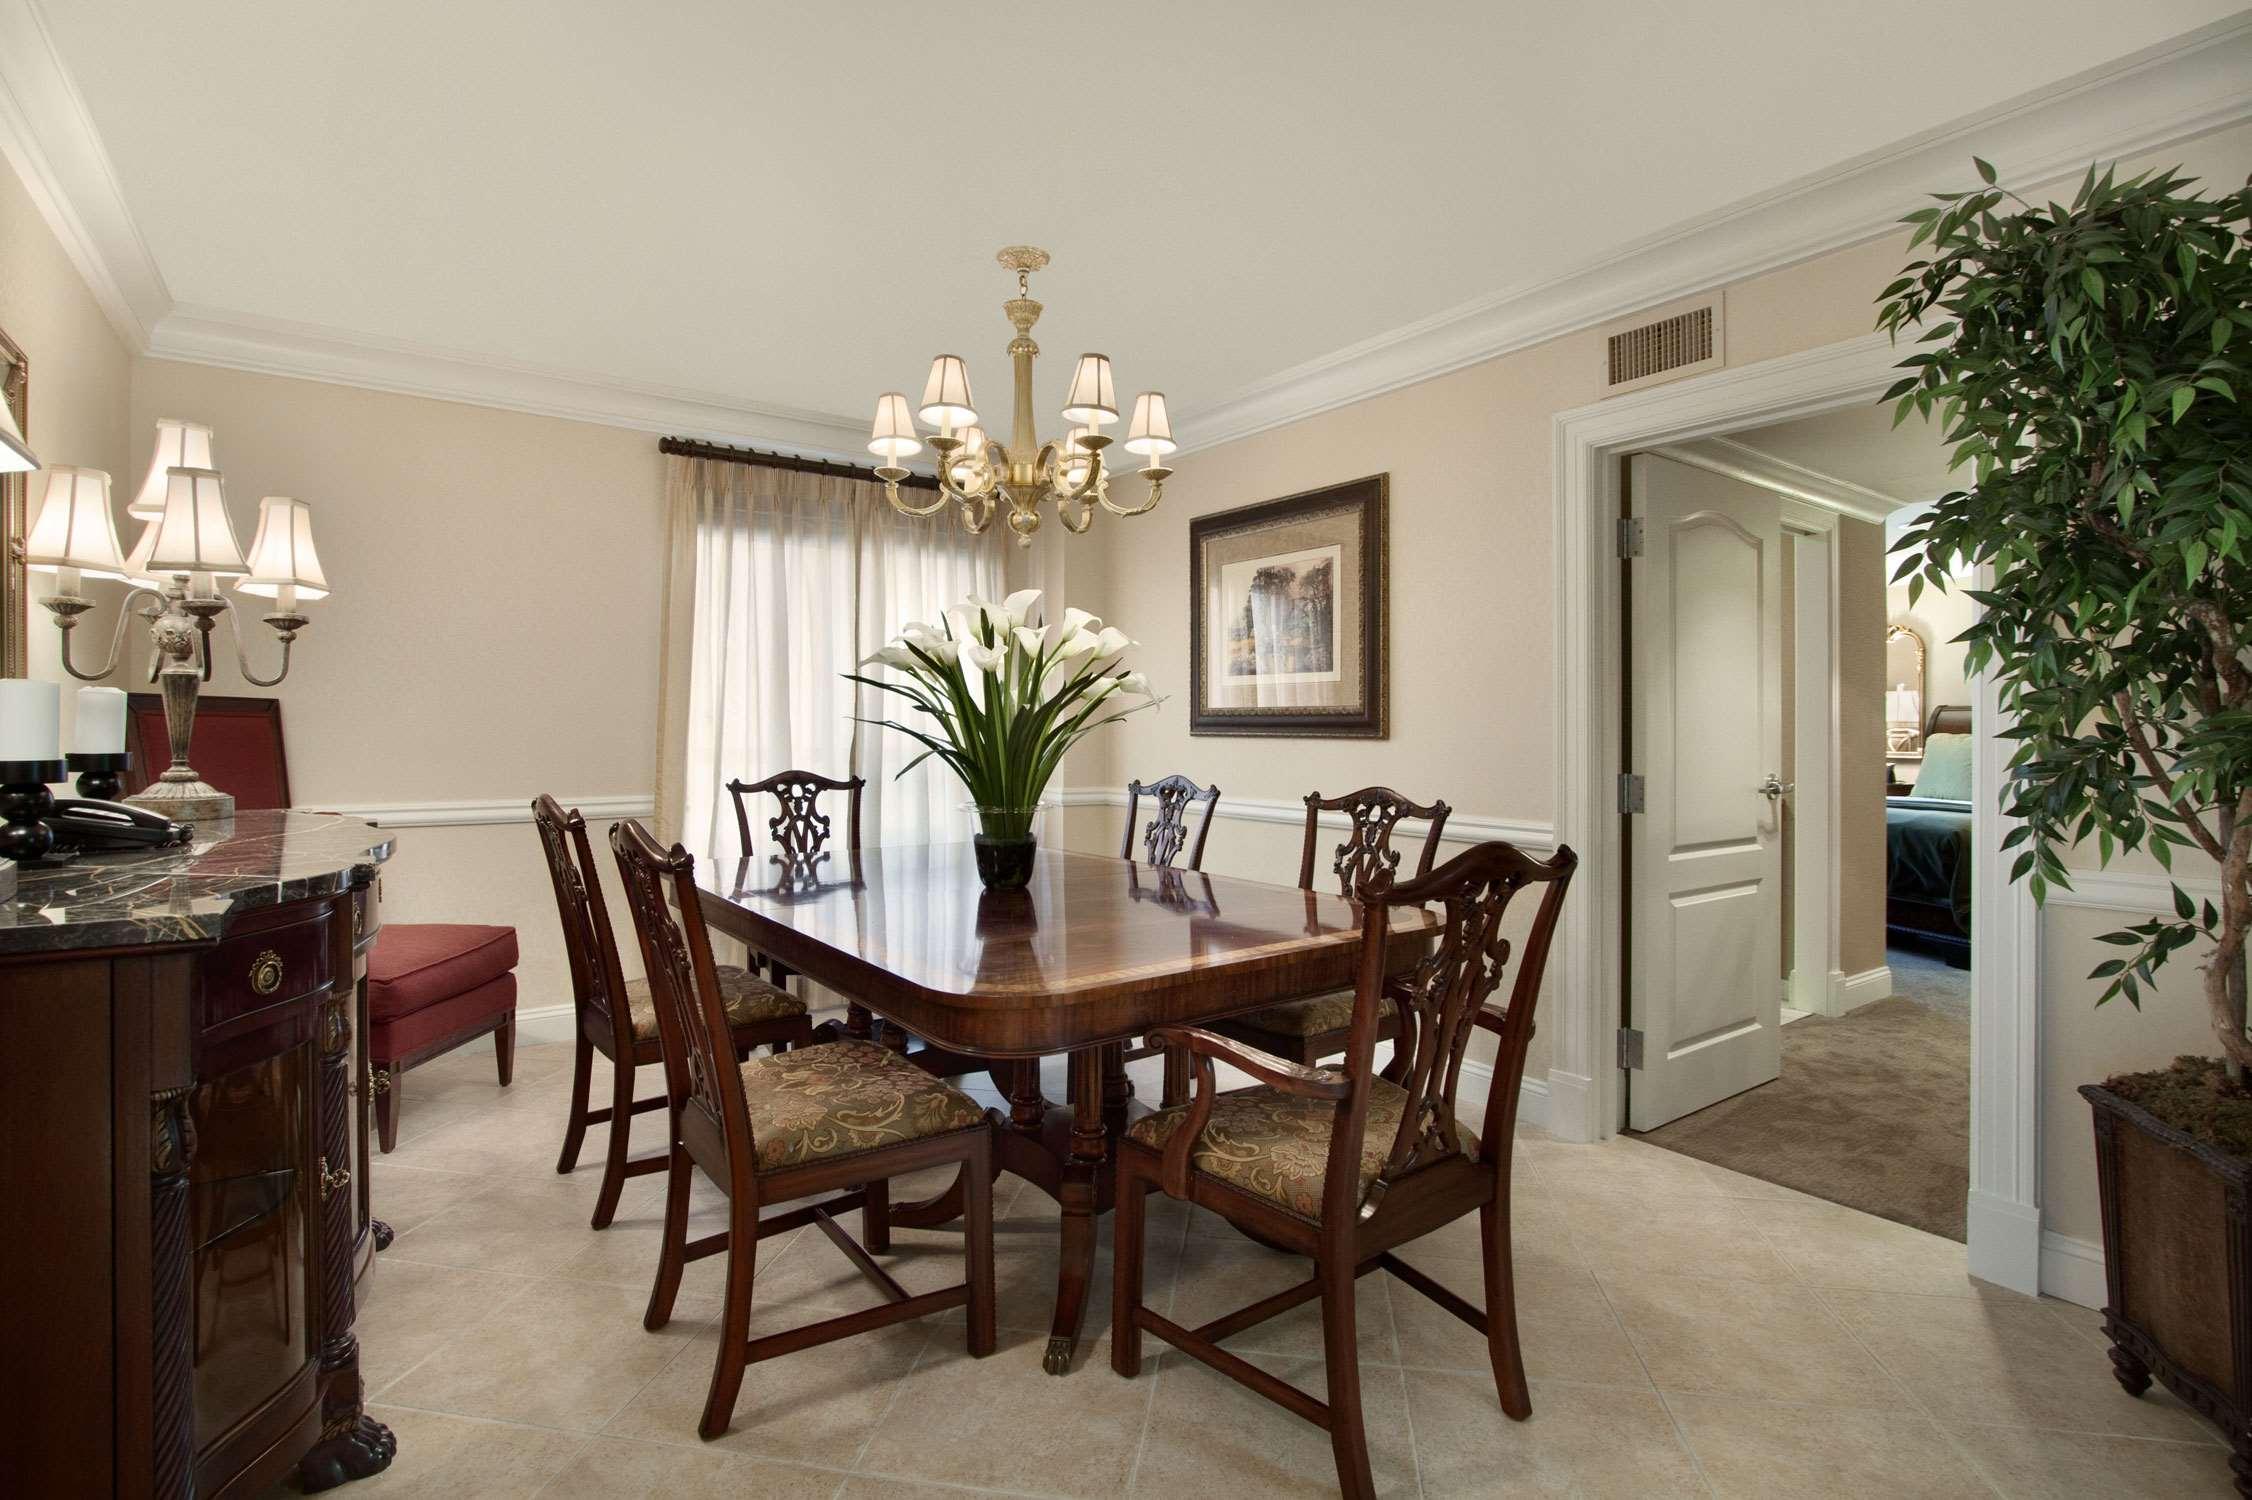 Embassy Suites by Hilton Washington DC Convention Center image 21